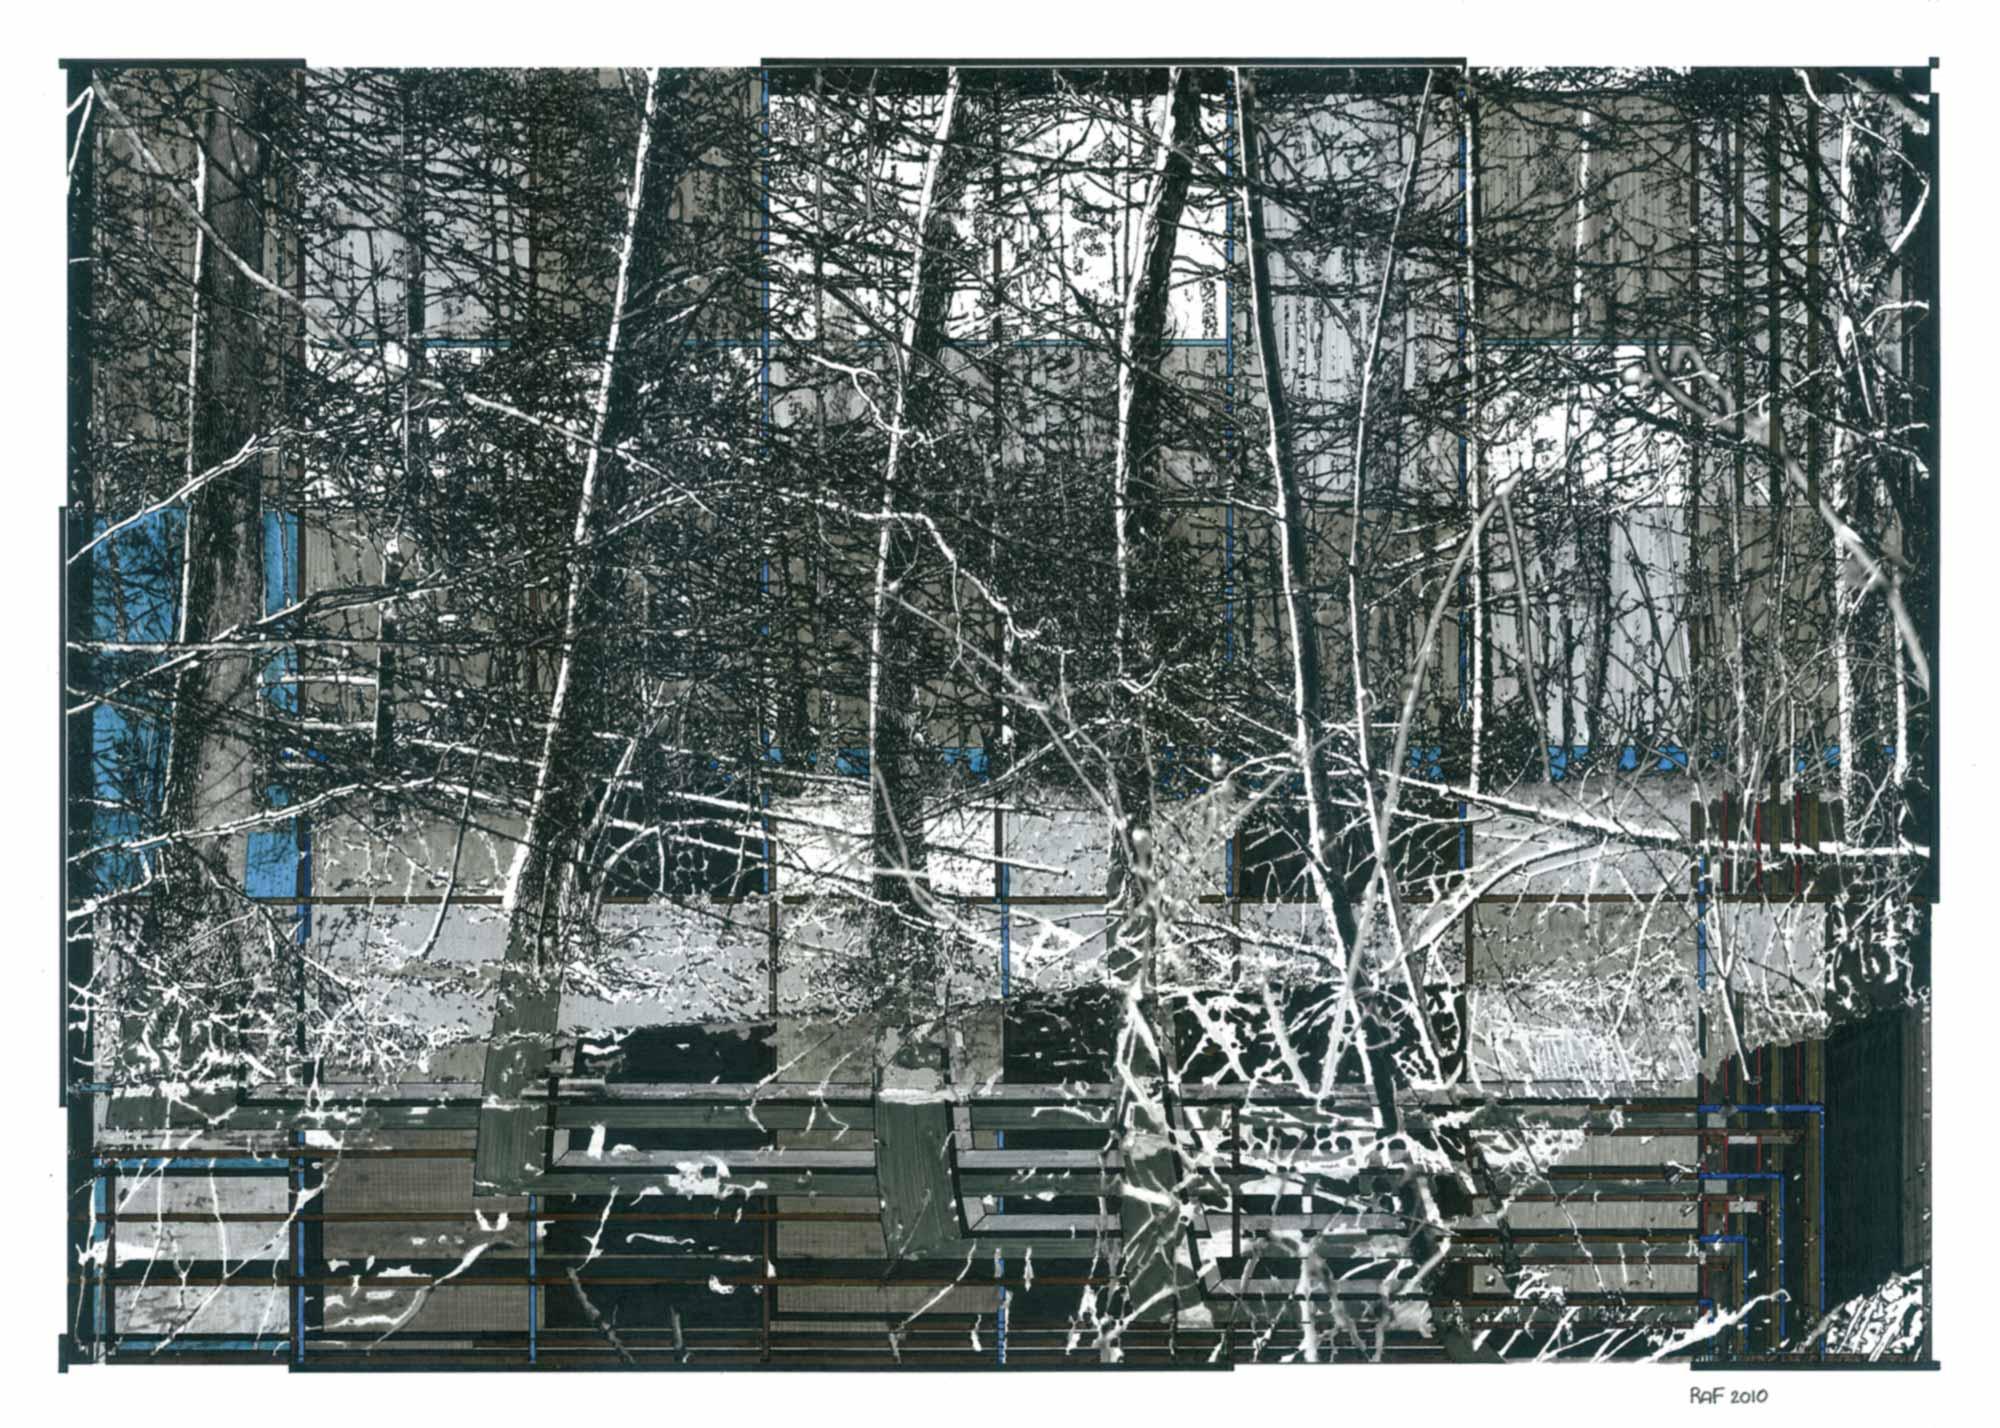 L'hiver, dessin, Raf Listowski, 2010